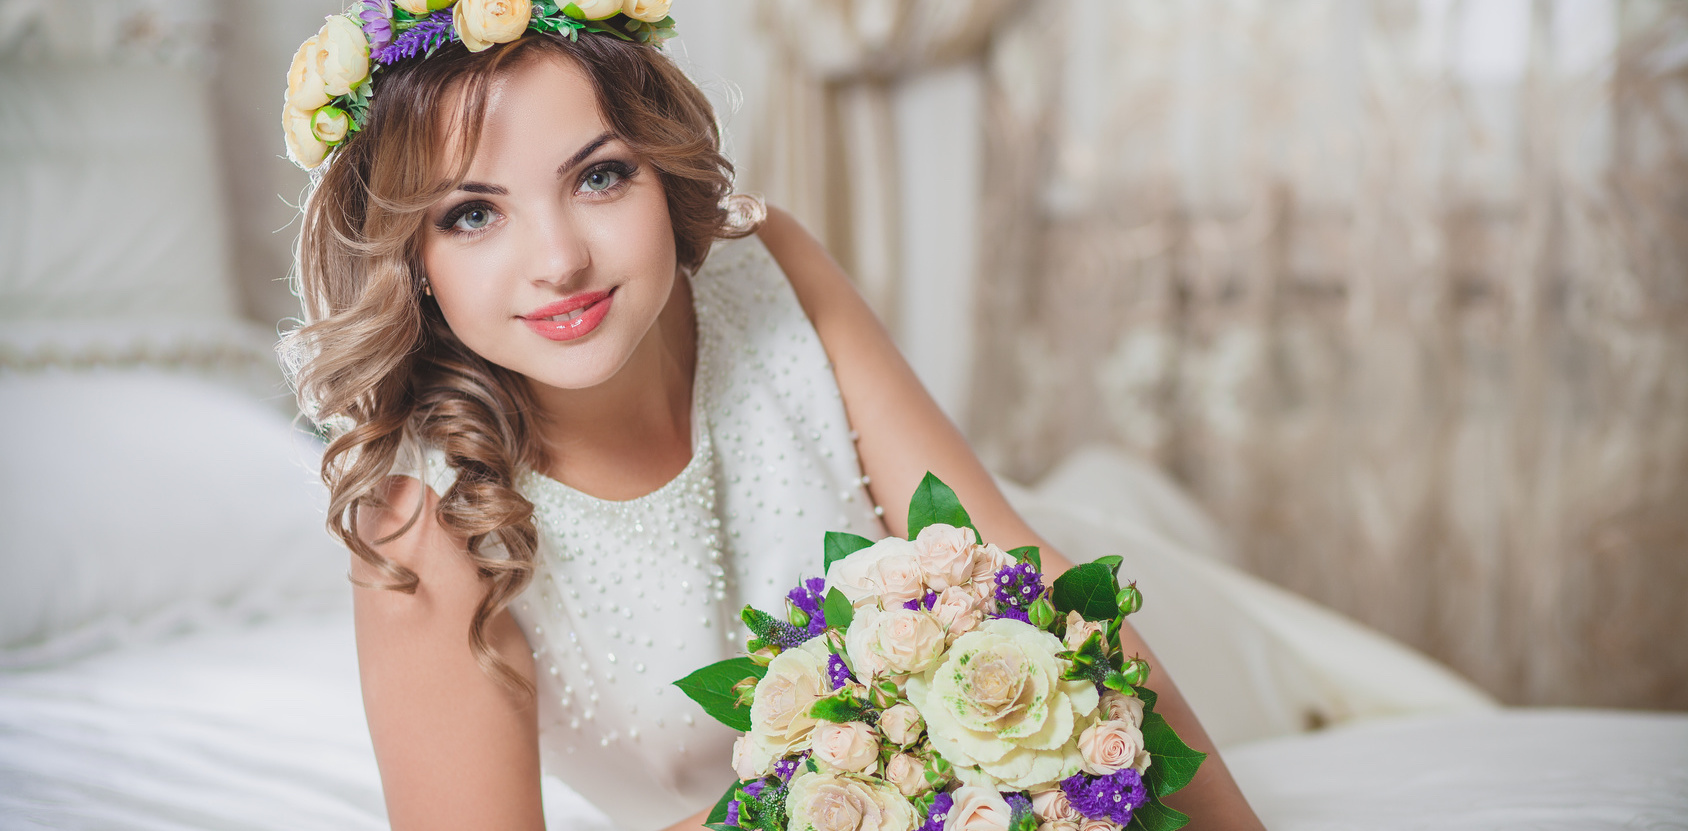 Buscar chicas de Bielorrusia